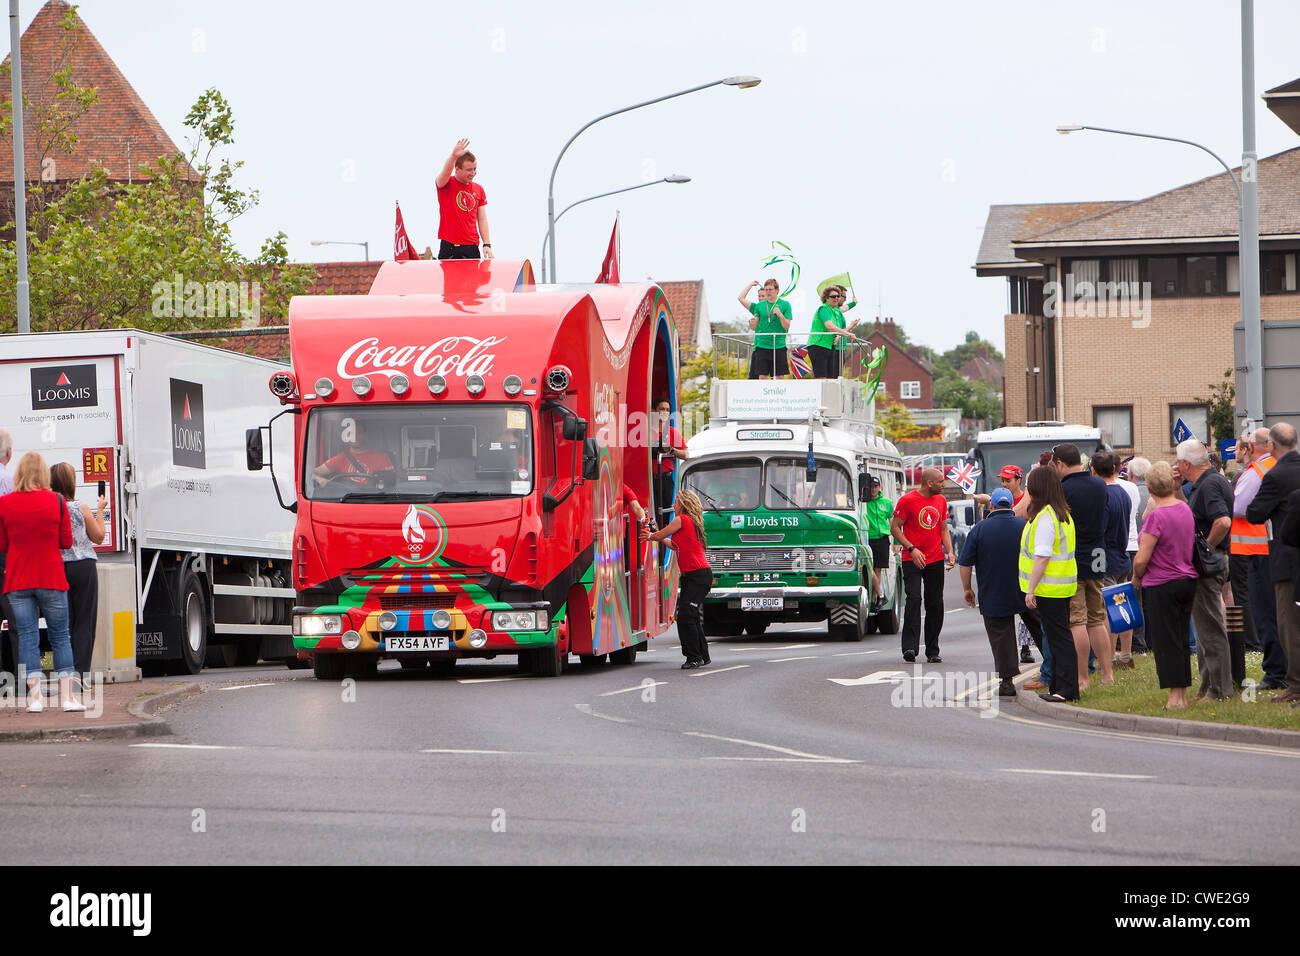 London 2012 Olympische Sponsor Coca Cola Float in Fackel-Relais-Prozession Stockbild